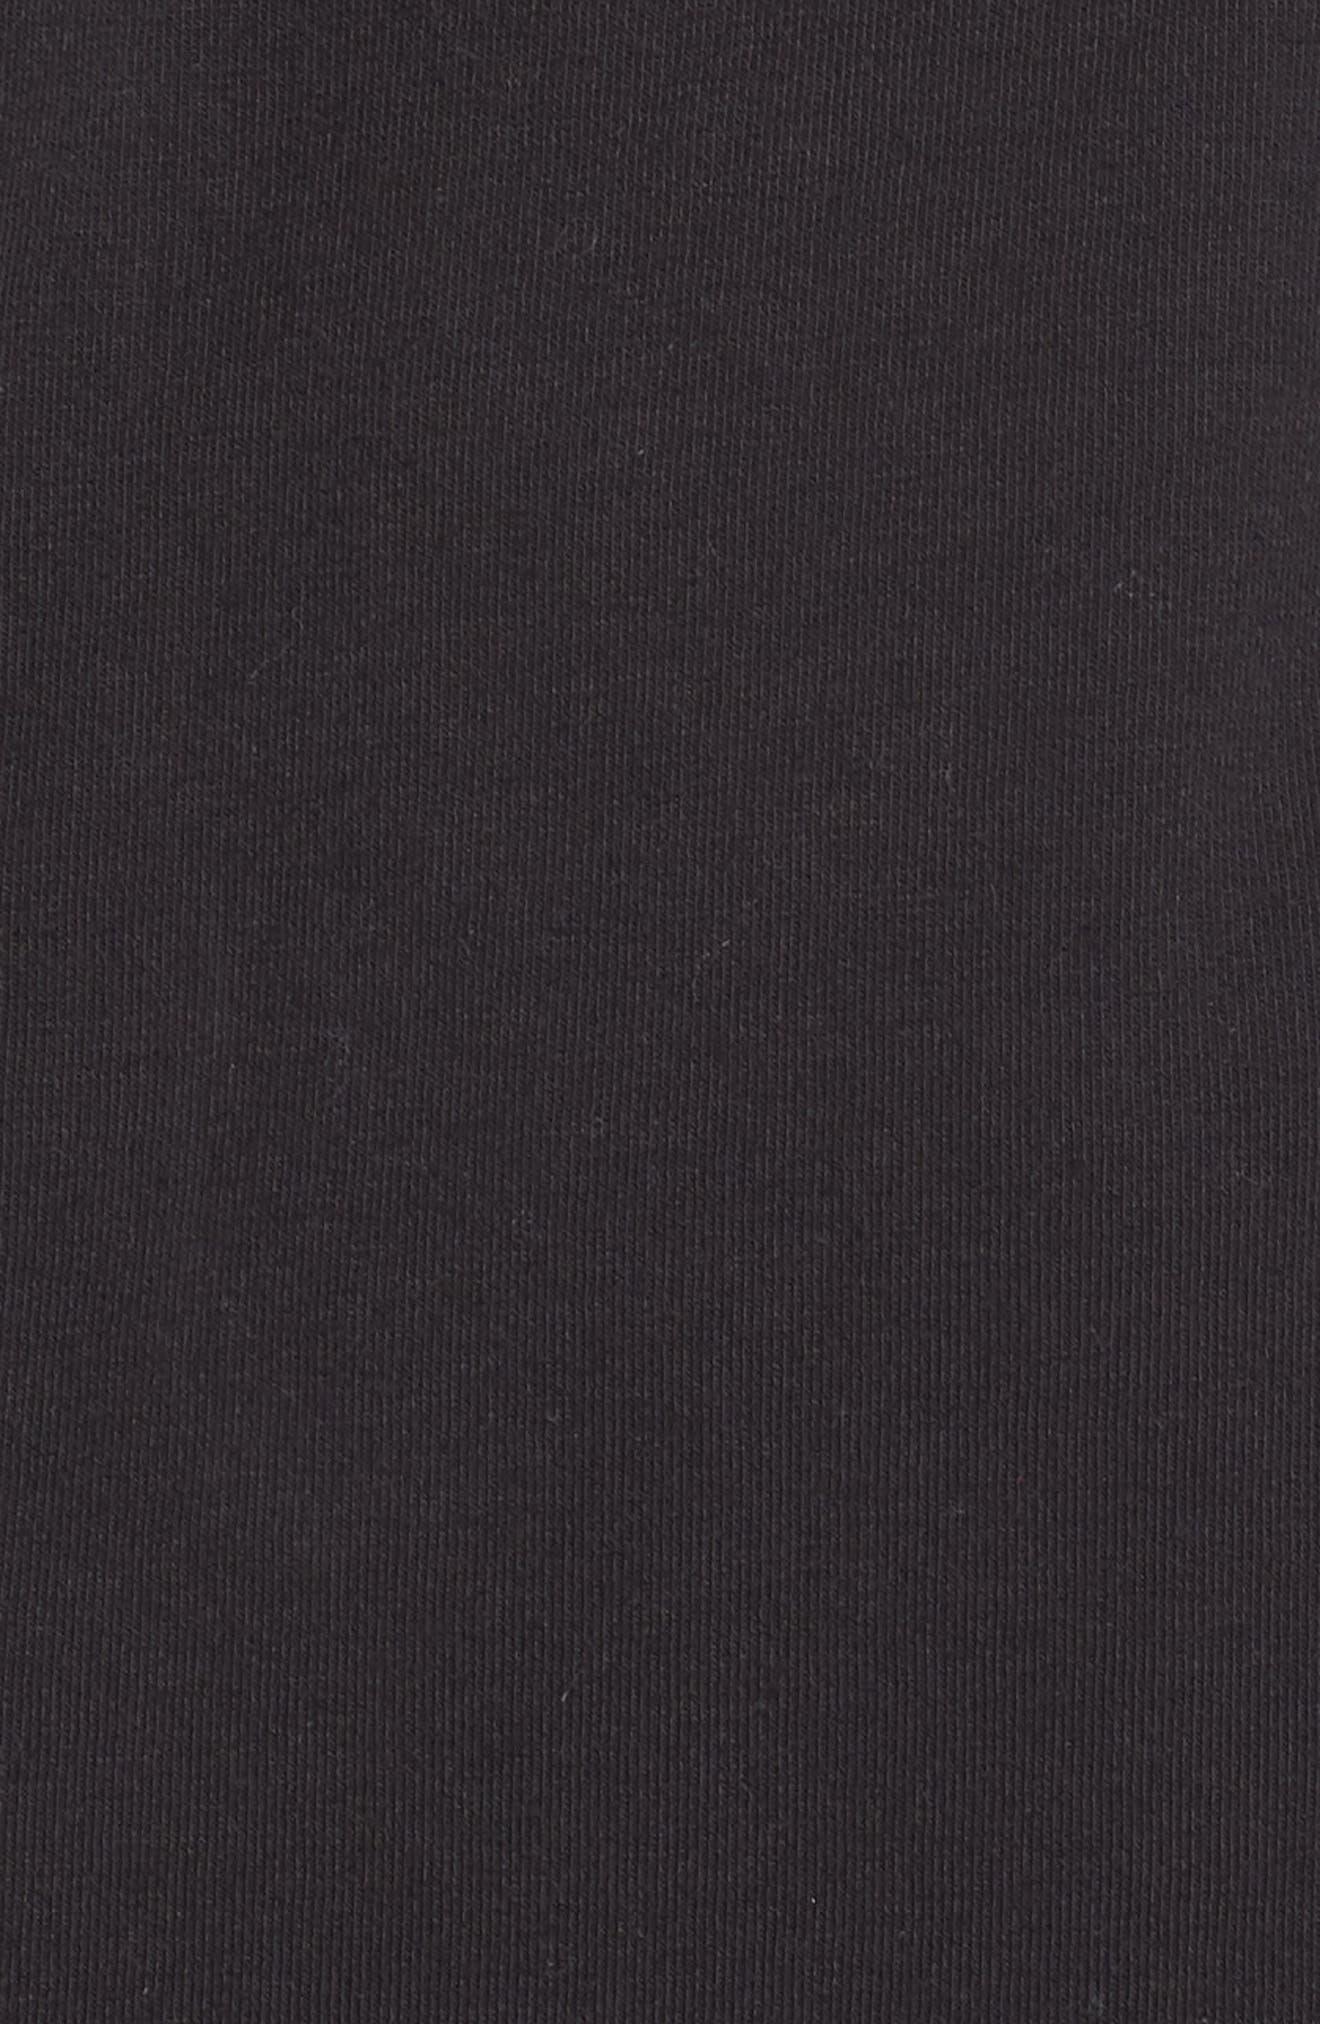 Erica Twist Cowl Neck Pullover,                             Alternate thumbnail 6, color,                             BLACK